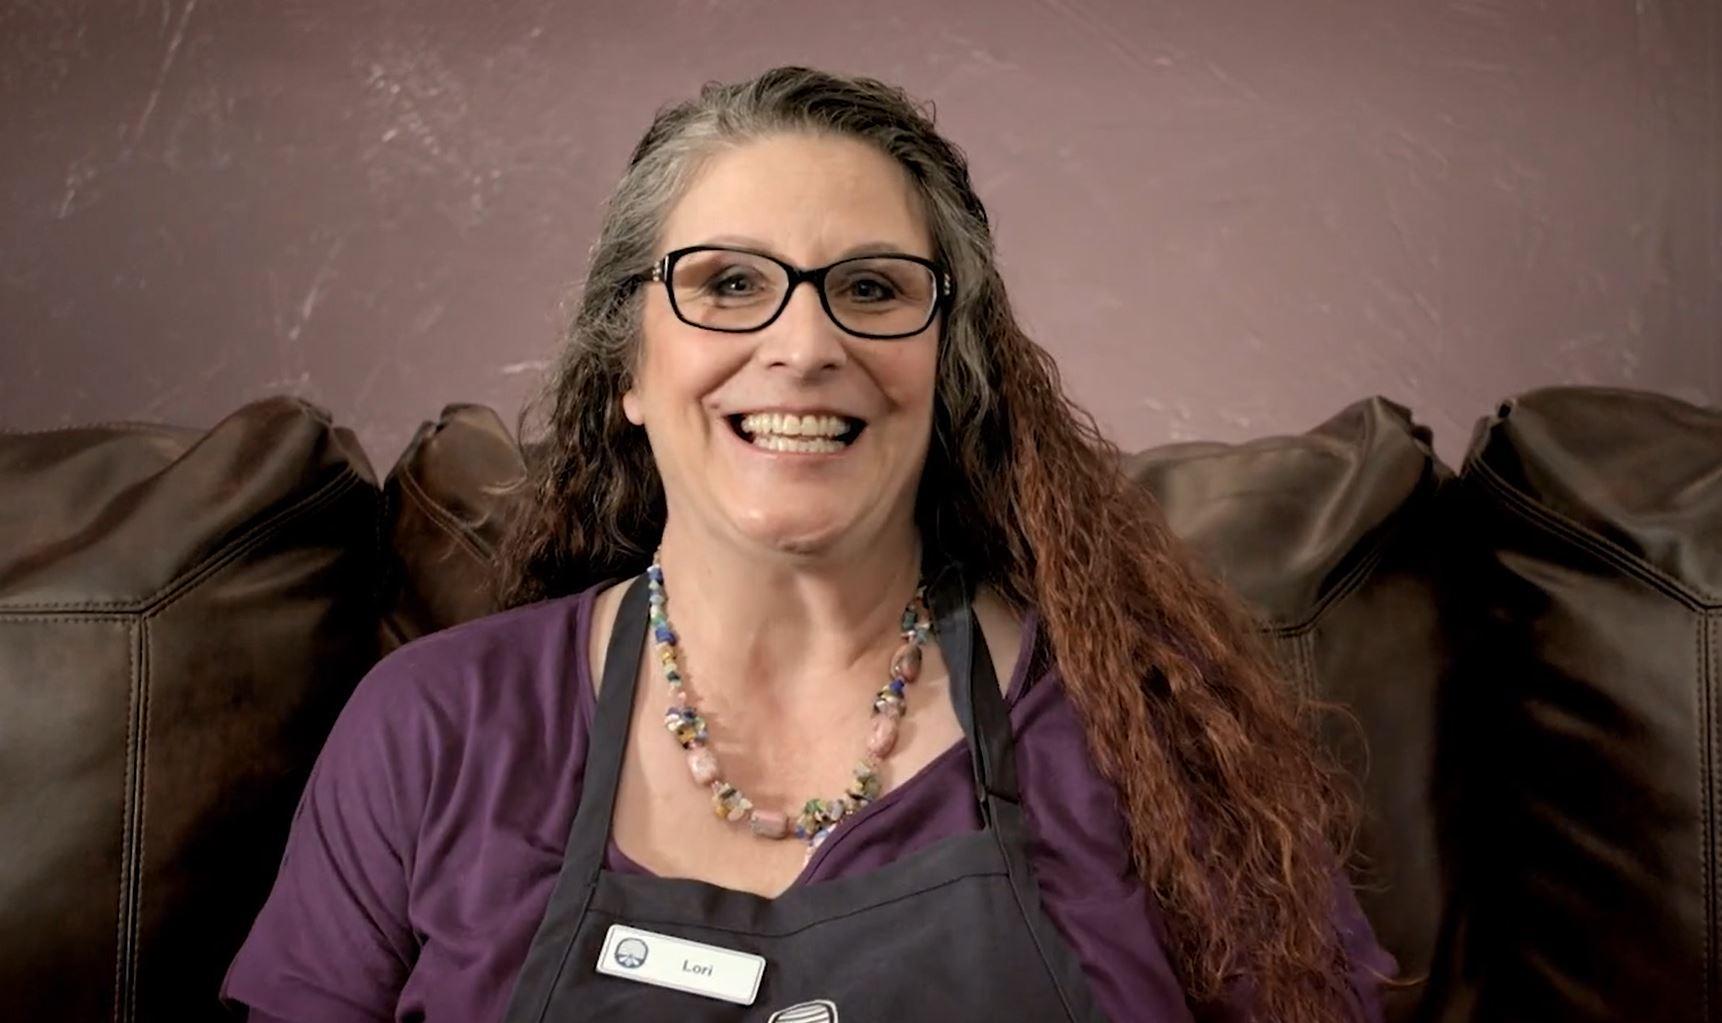 Former associate Lori smiles